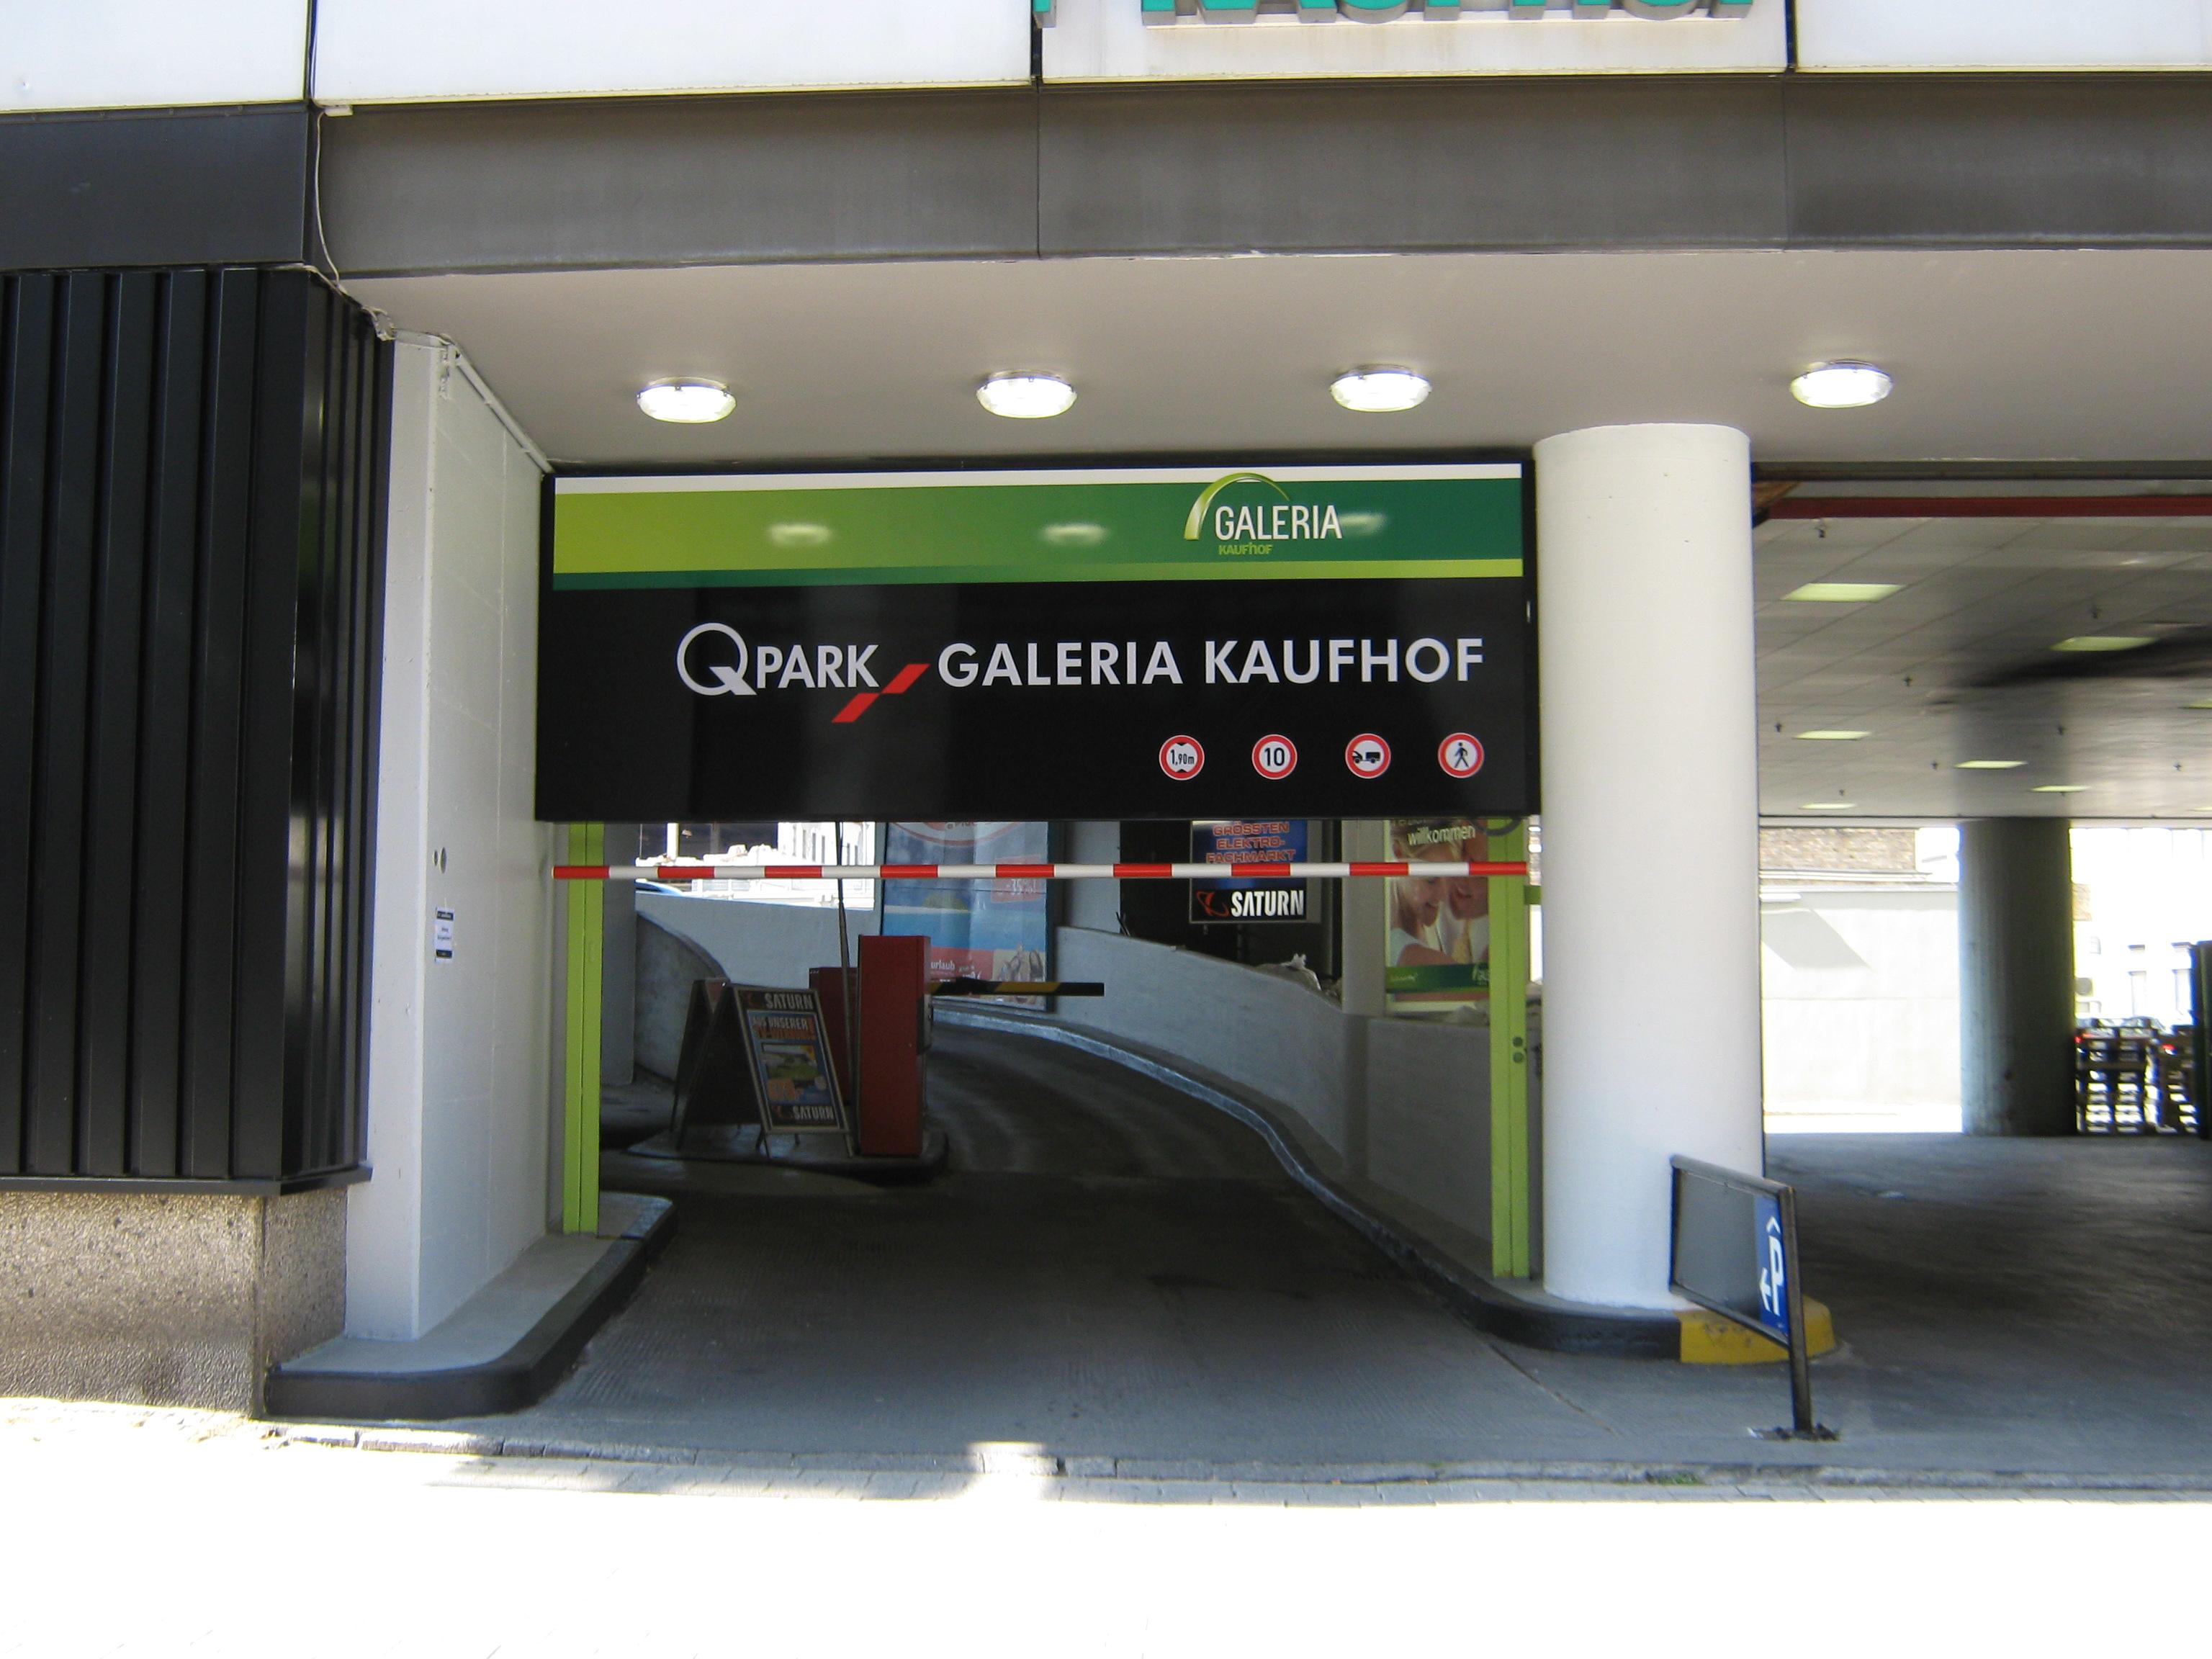 Kaufhof Kolpingstrasse Tiefgarage Dortmund Q Park